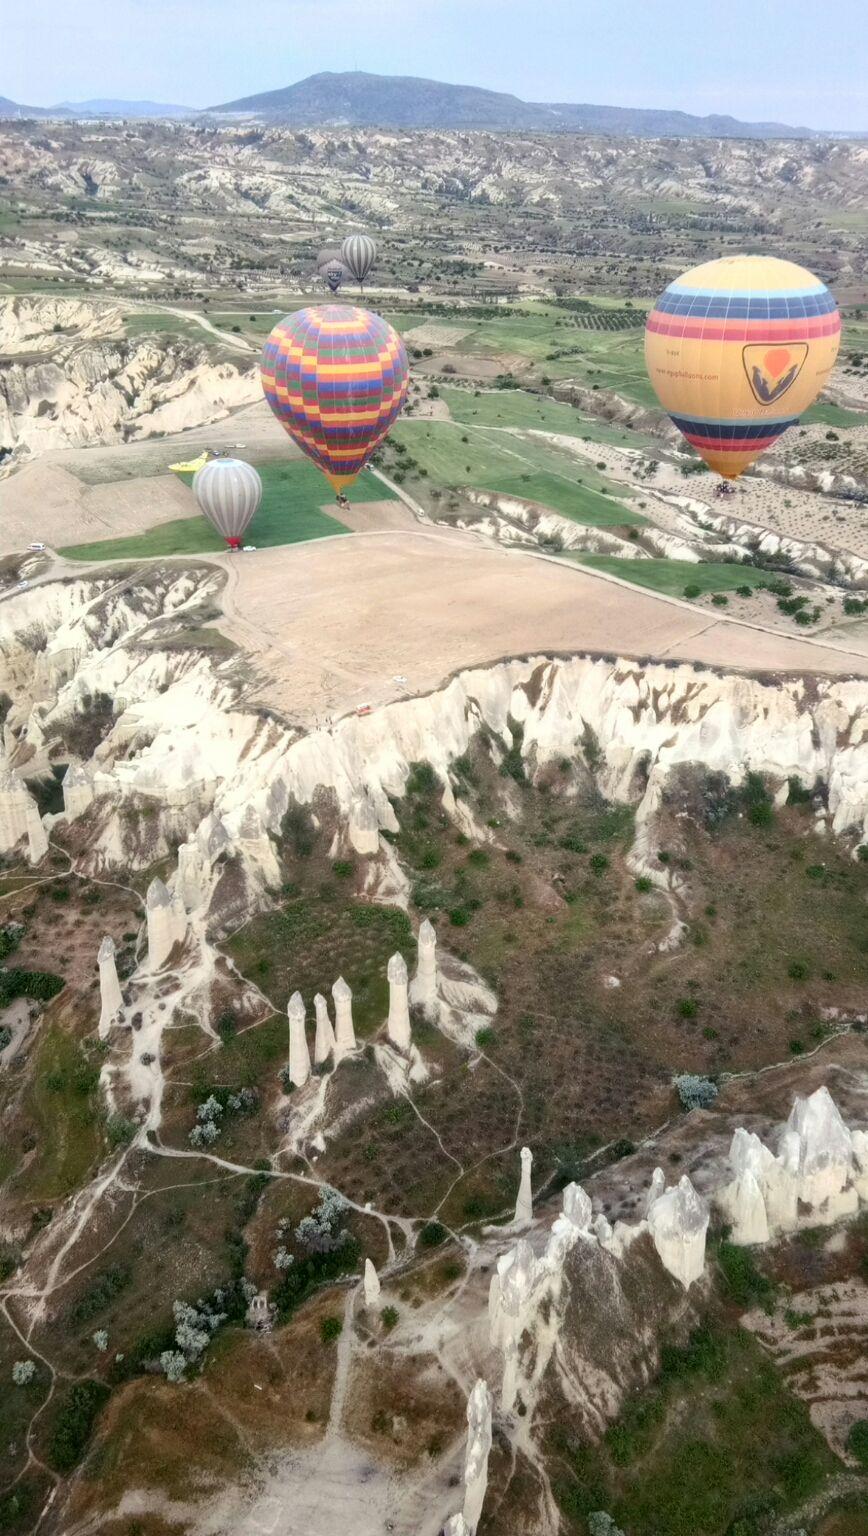 Photo of Hot Air Balloon Cappadocia By Aditi Chaudhary